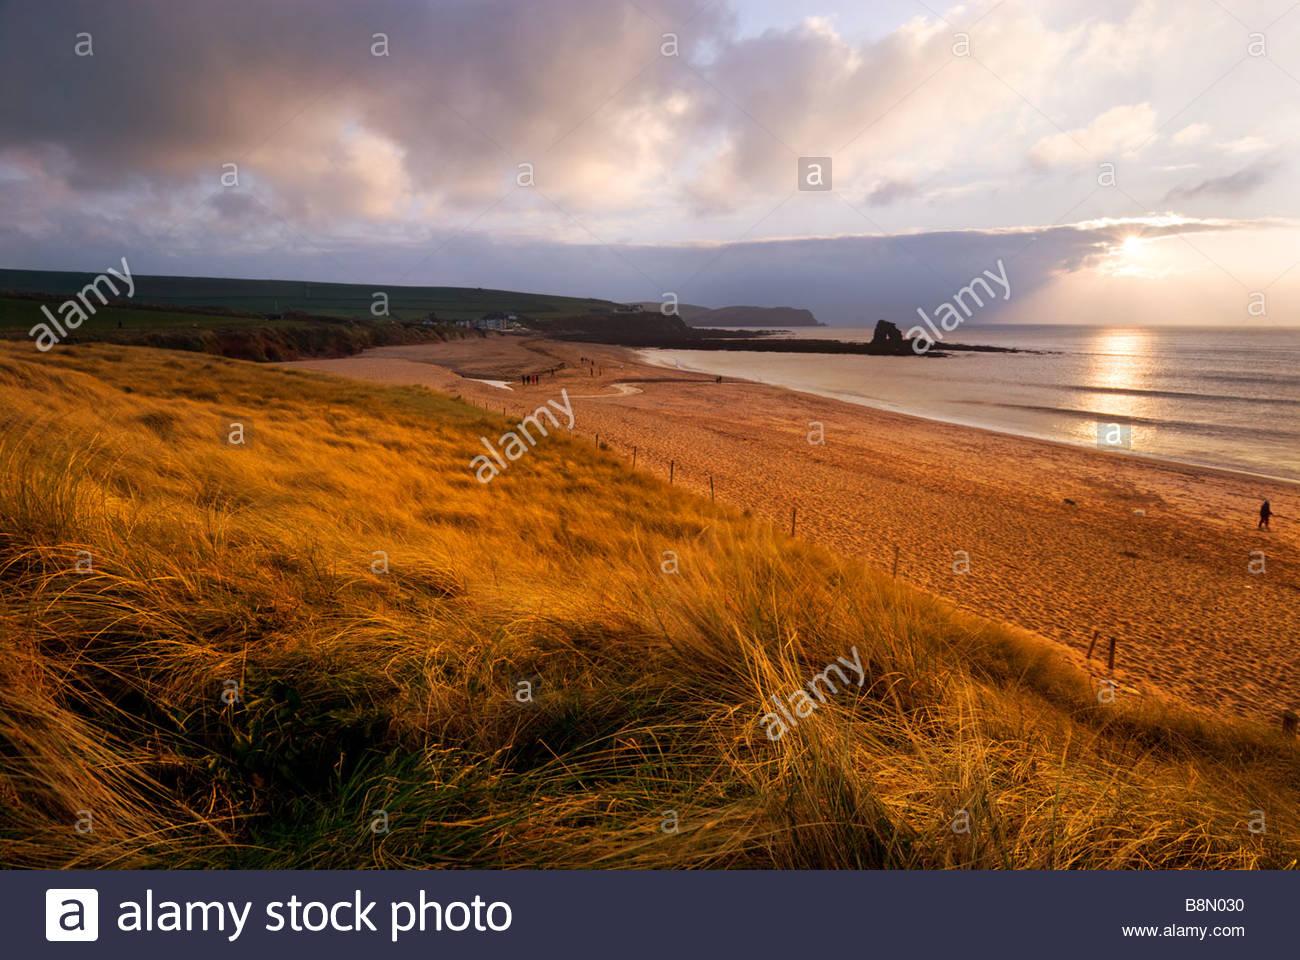 Thurlestone Beach, South Devon, England, UK. Stockbild